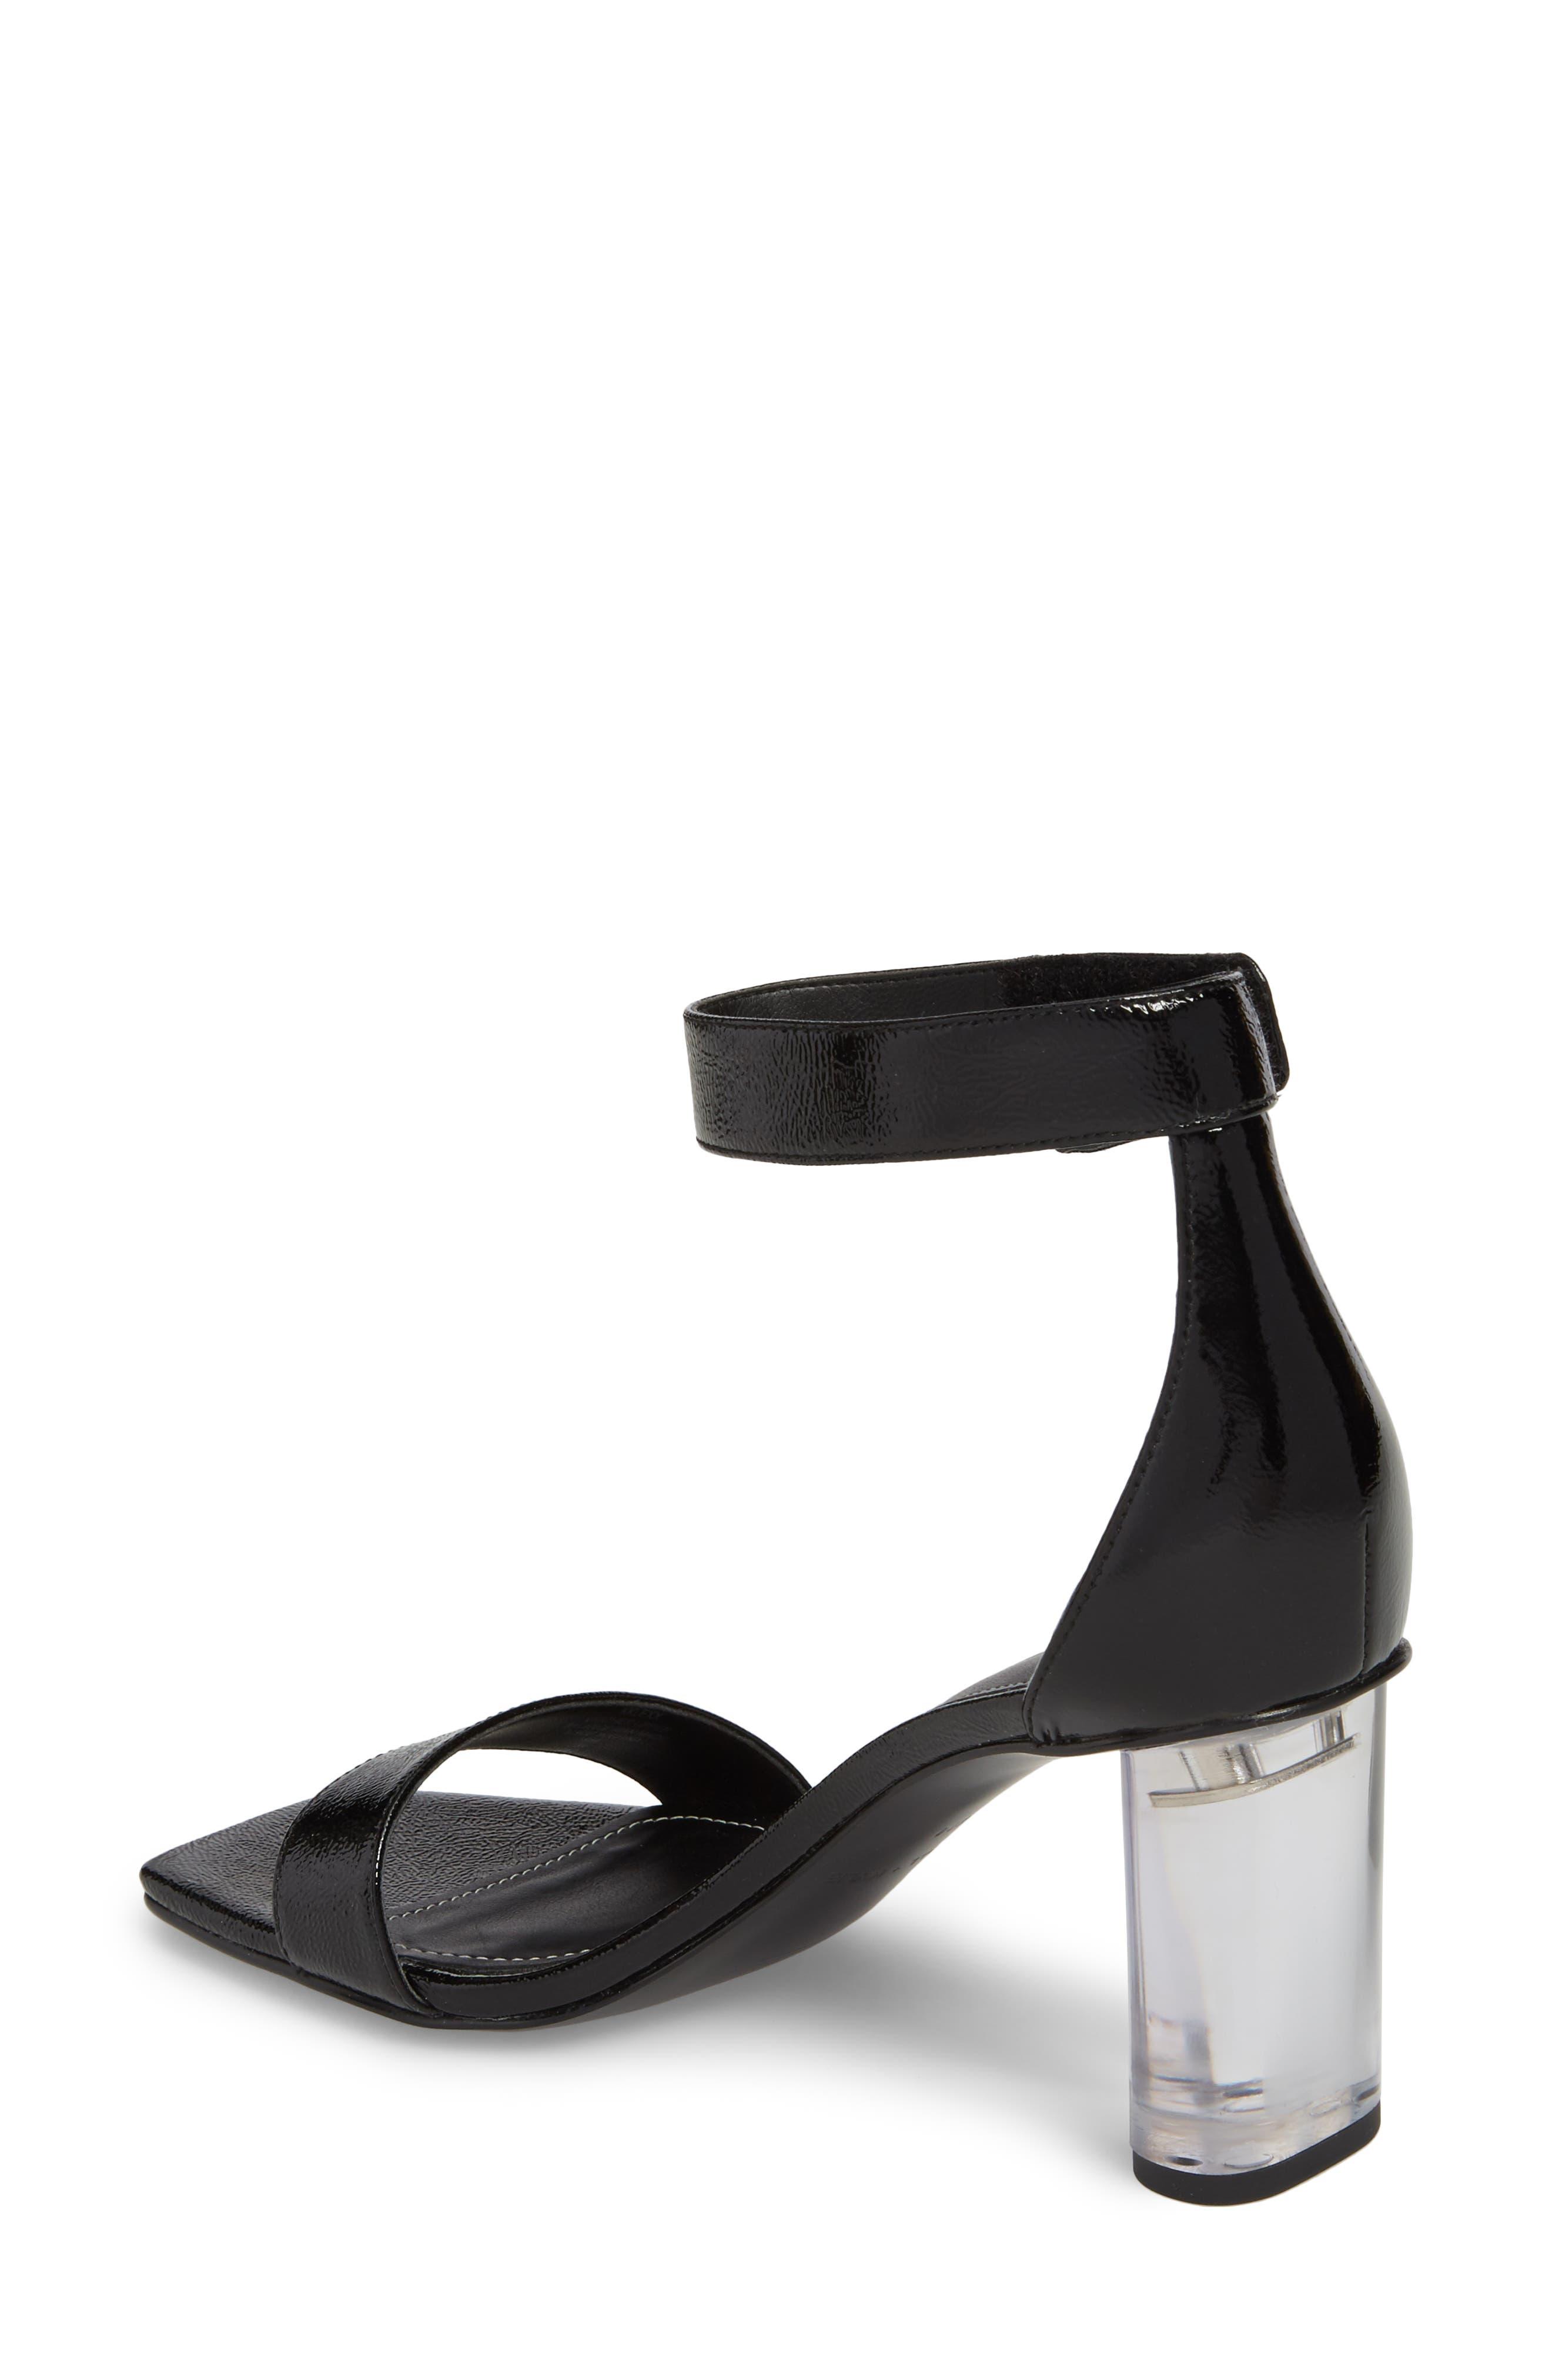 Lexx Ankle Strap Sandal,                             Alternate thumbnail 2, color,                             BLACK